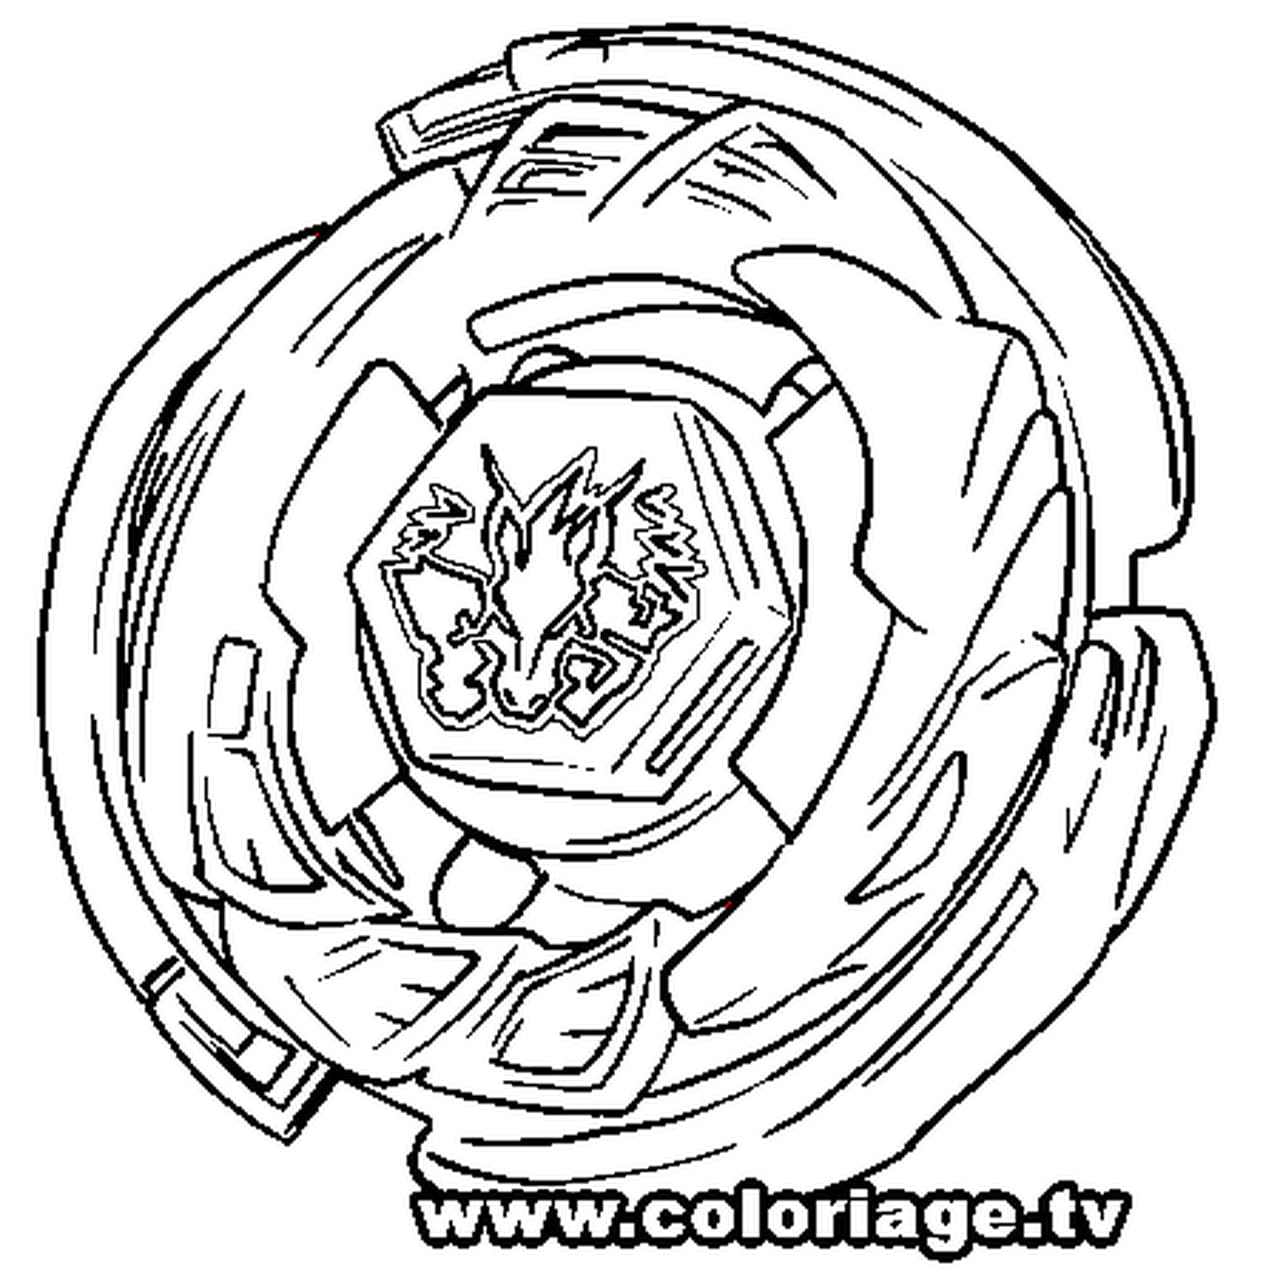 Coloriage Beyblade Imprimer.Coloriage Beyblade Pegasus En Ligne Gratuit A Imprimer